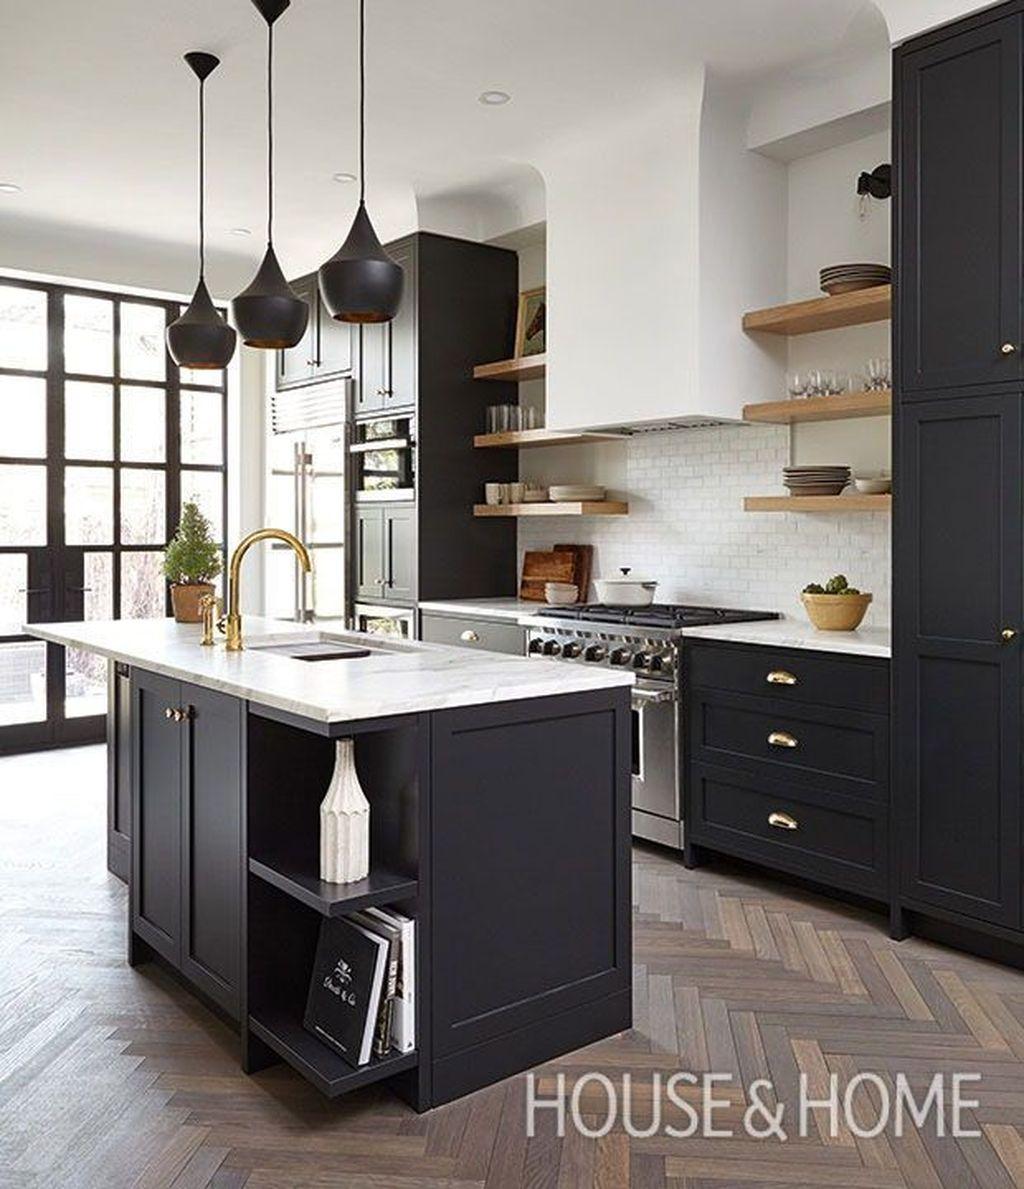 Wonderful European Interior Design Ideas To Inspire Yourself 29